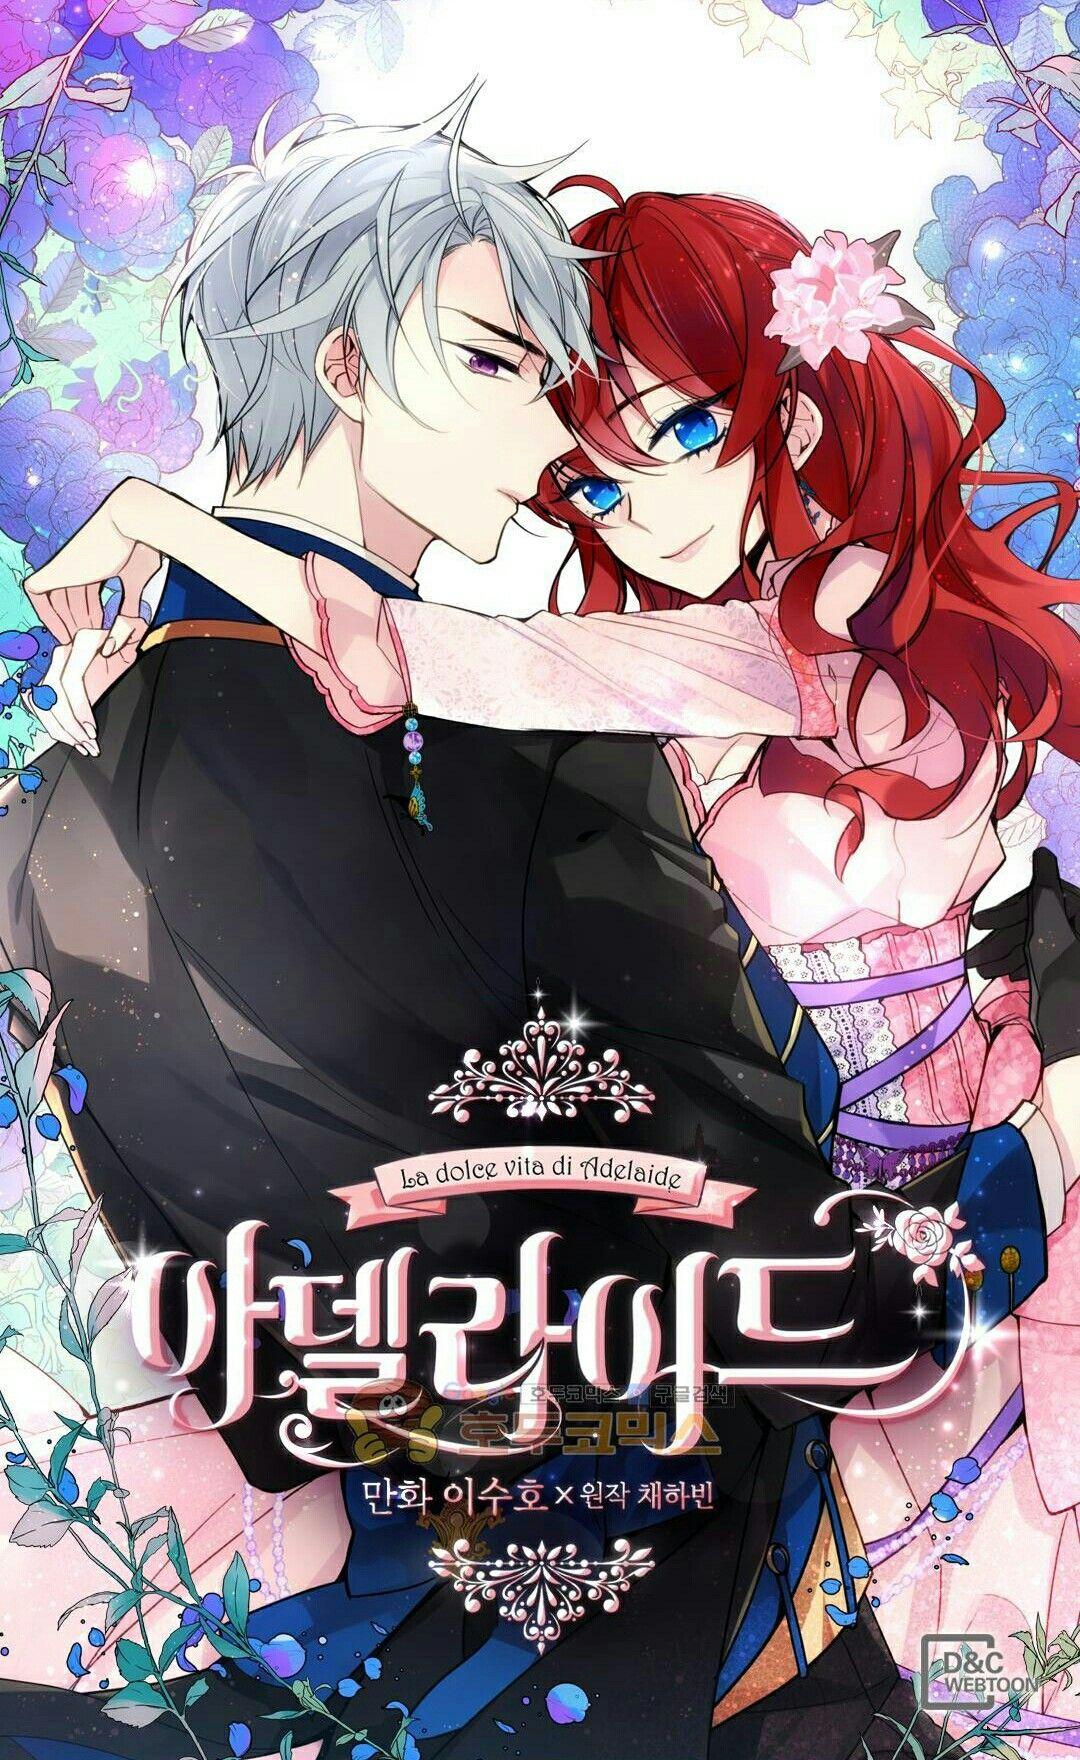 Pin de Scarlet_Iris 6106 en Manga en 2020 Historieta